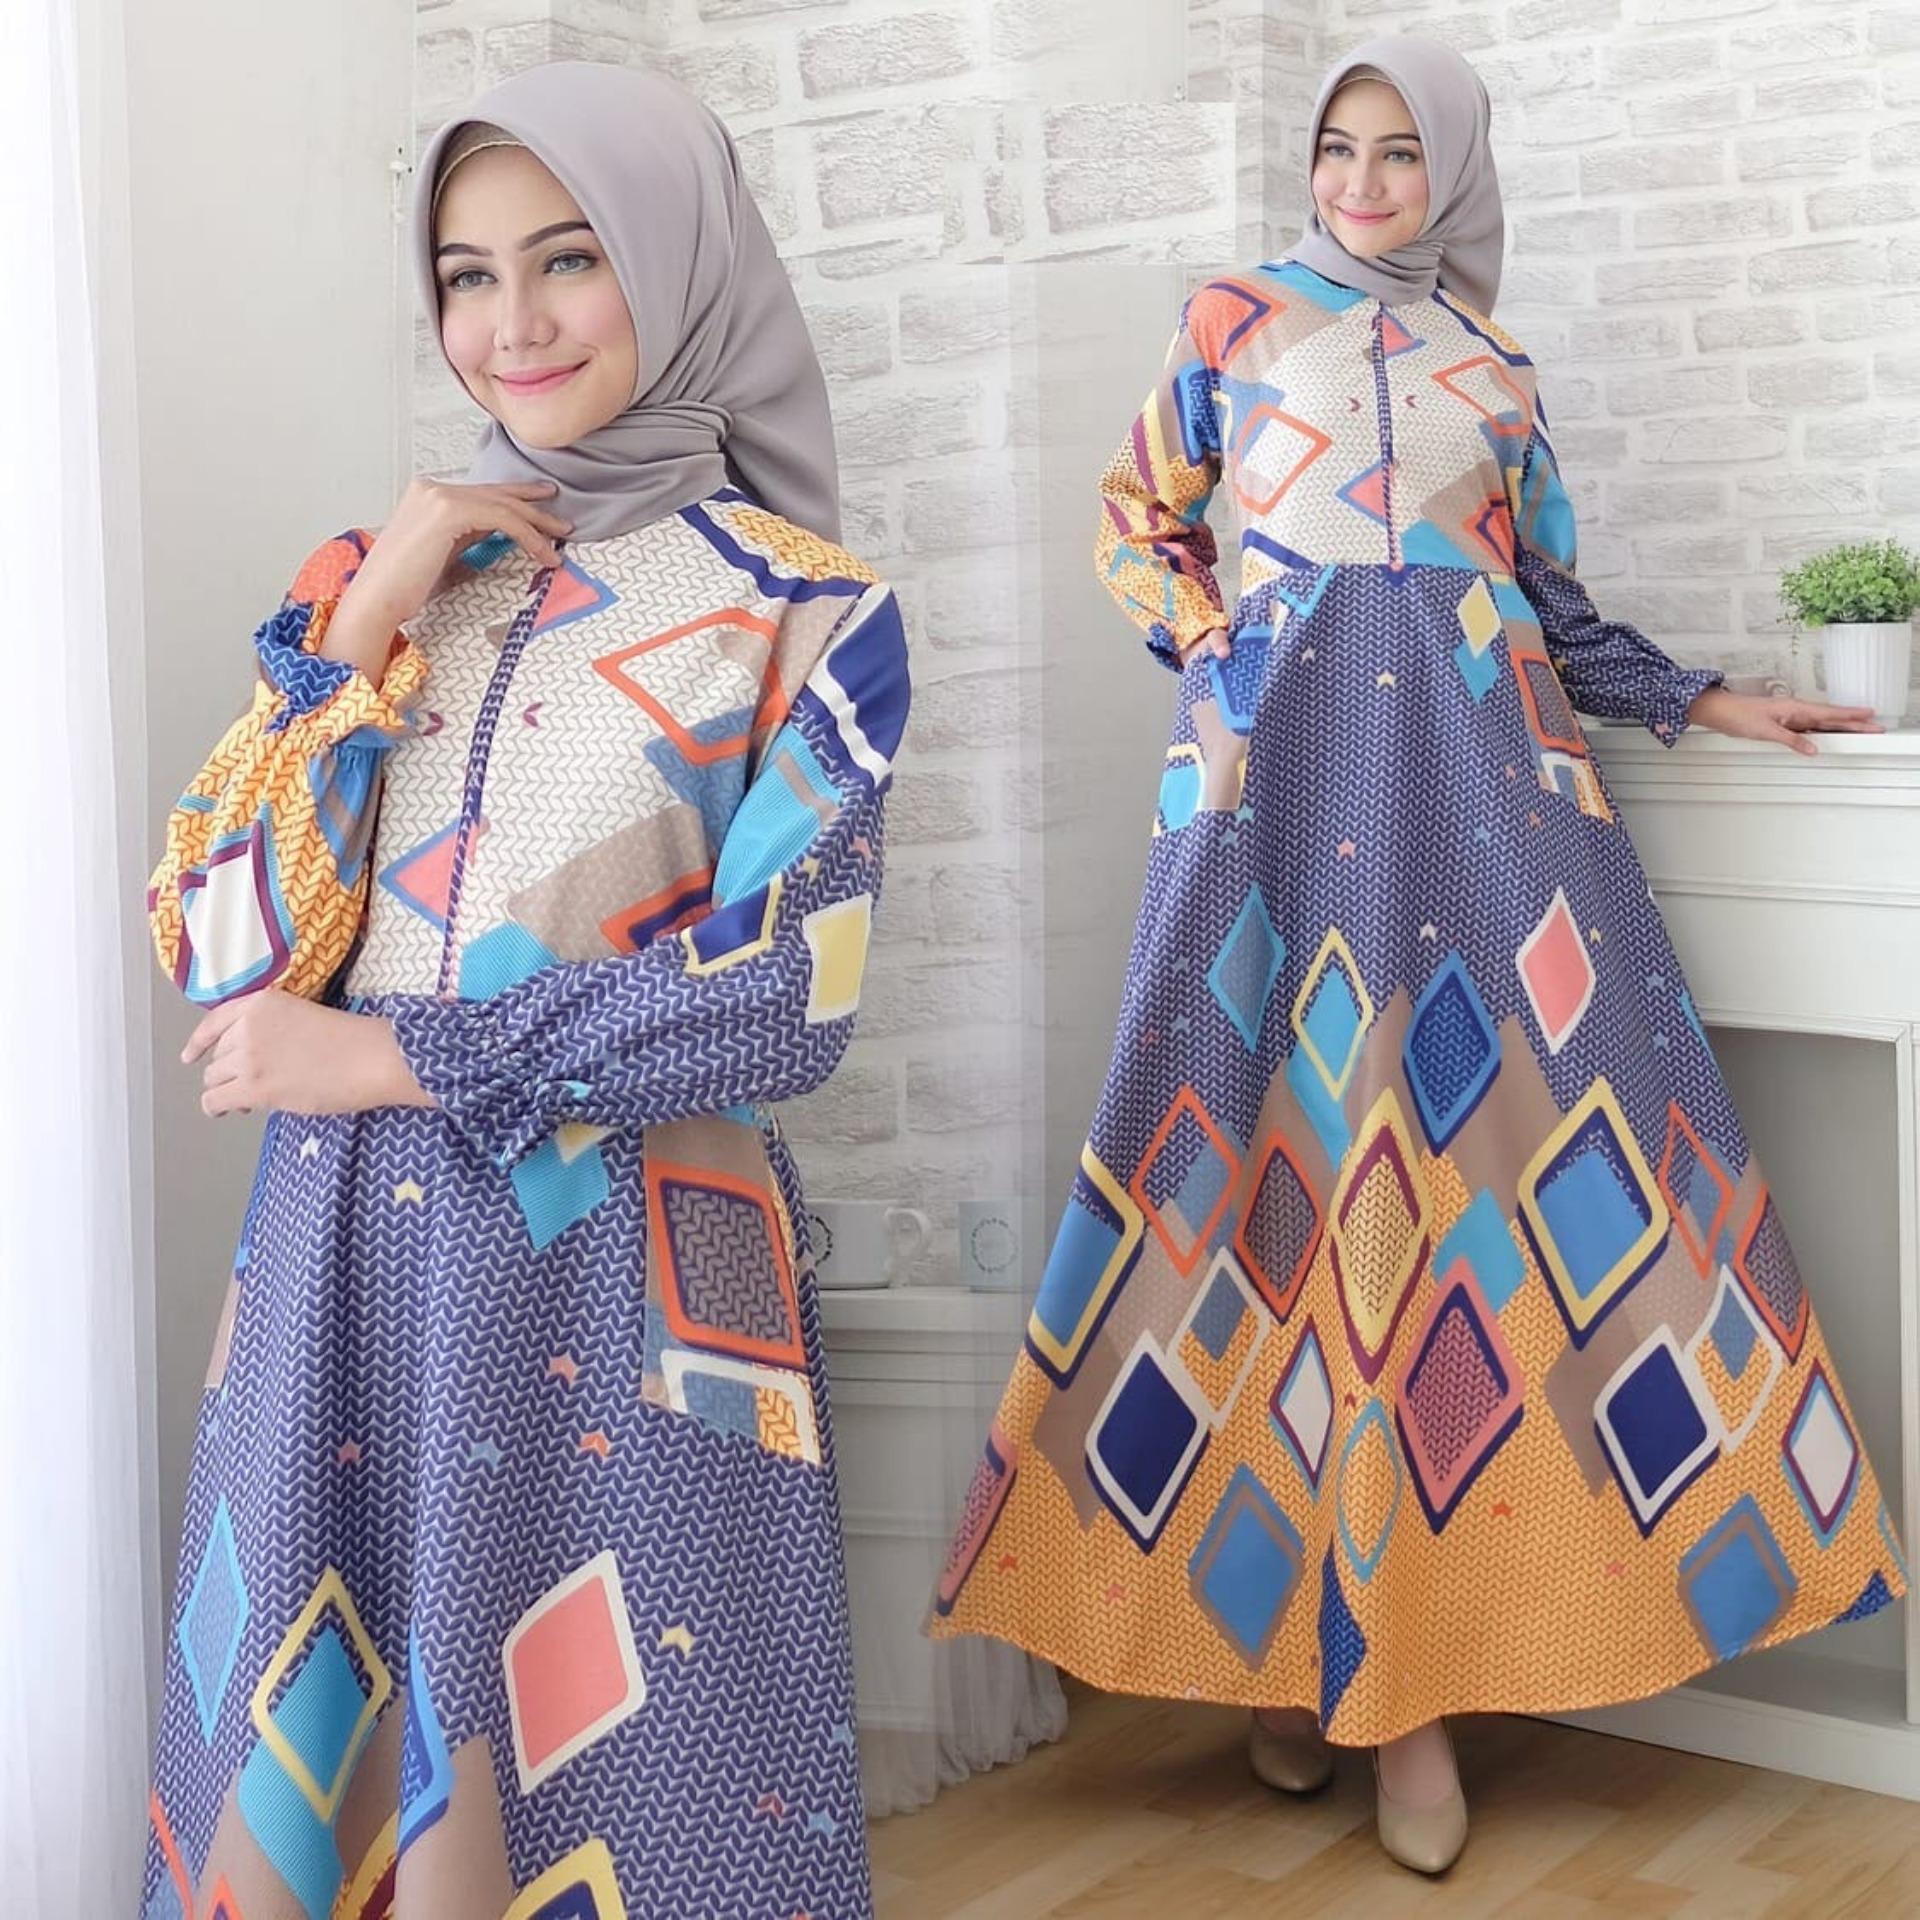 Jual Gamis Terbaru Terlengkap Khimar Panjang Pinguin Maxi Dress Lengan Busui Katun Jepang Motif Msr289 Syari Kasual Gaun Muslimah